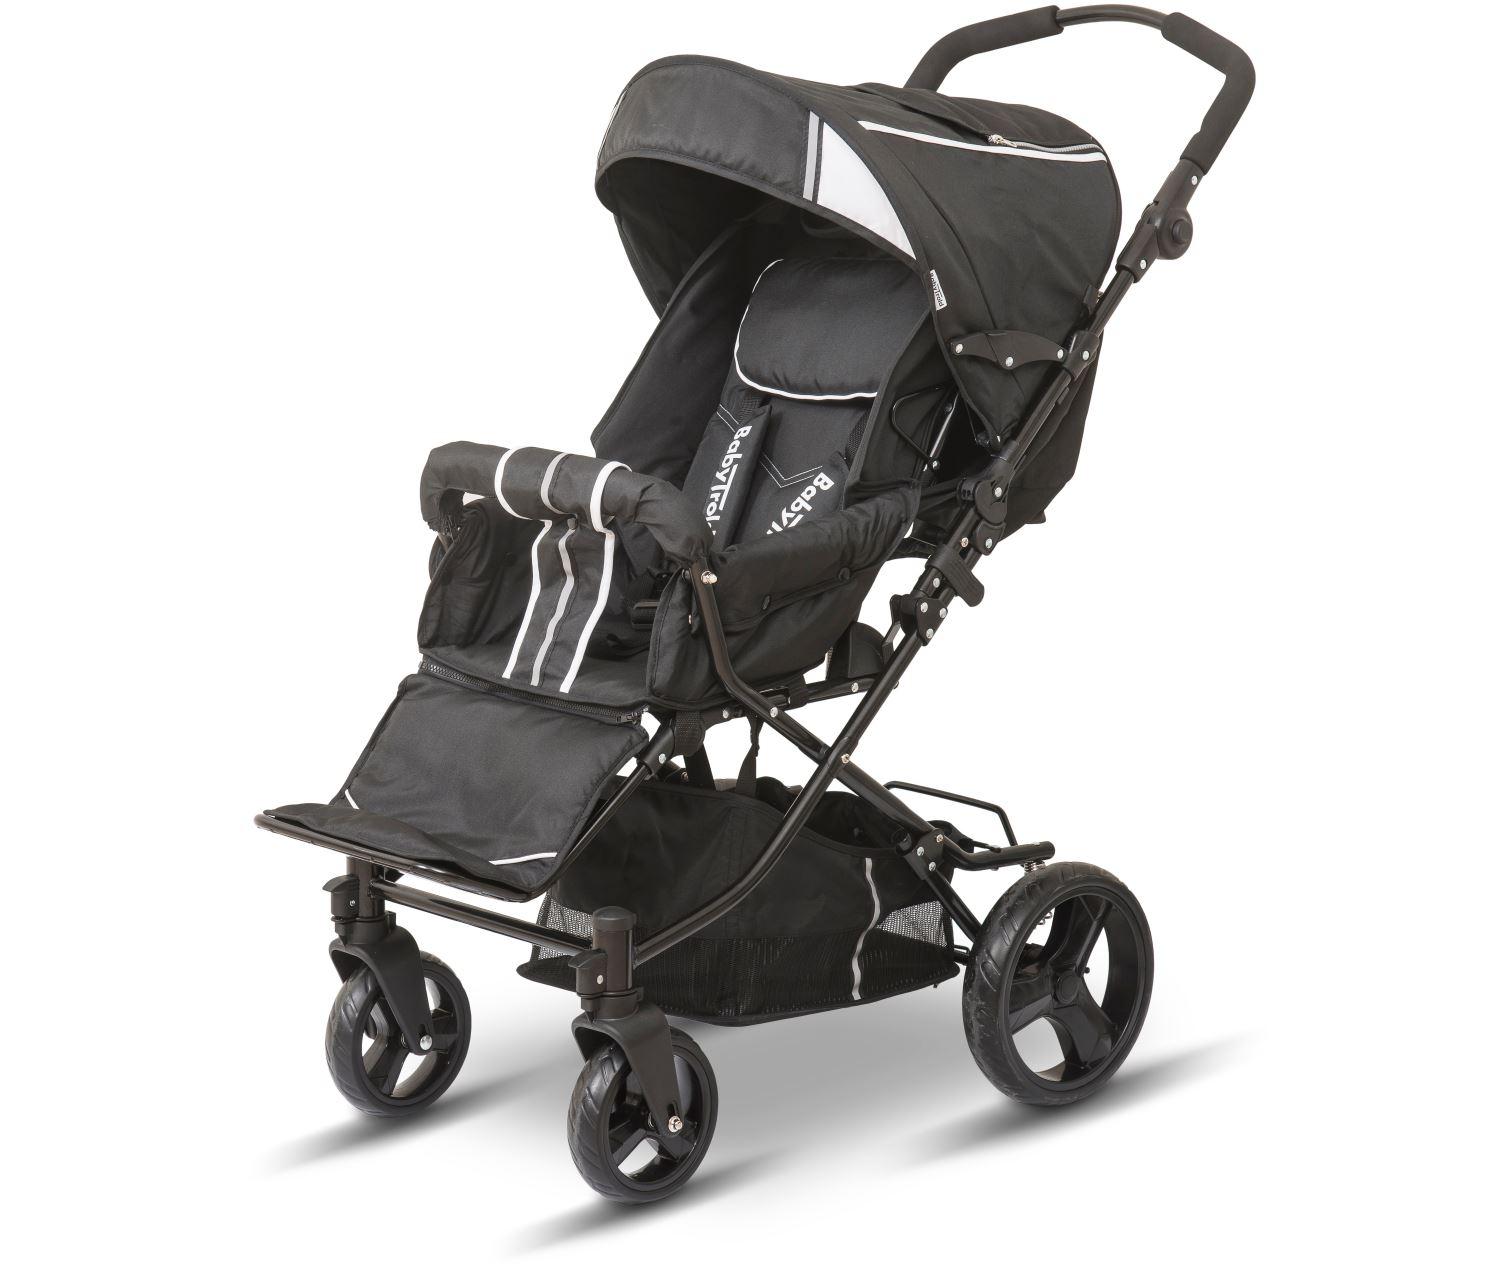 Babytrold Roller Onlinekids se